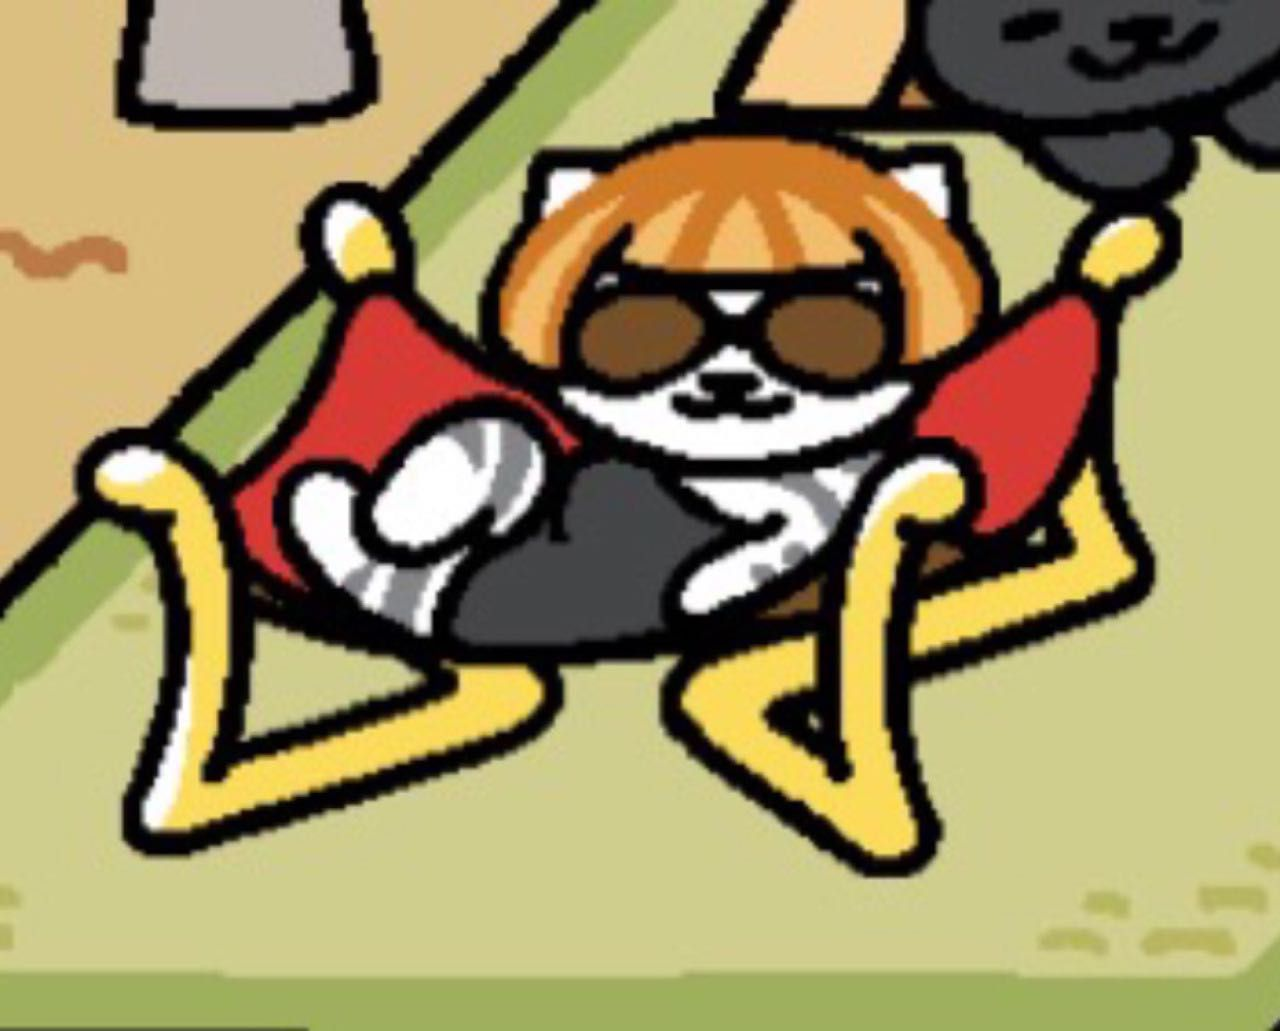 Lady Meow Meow